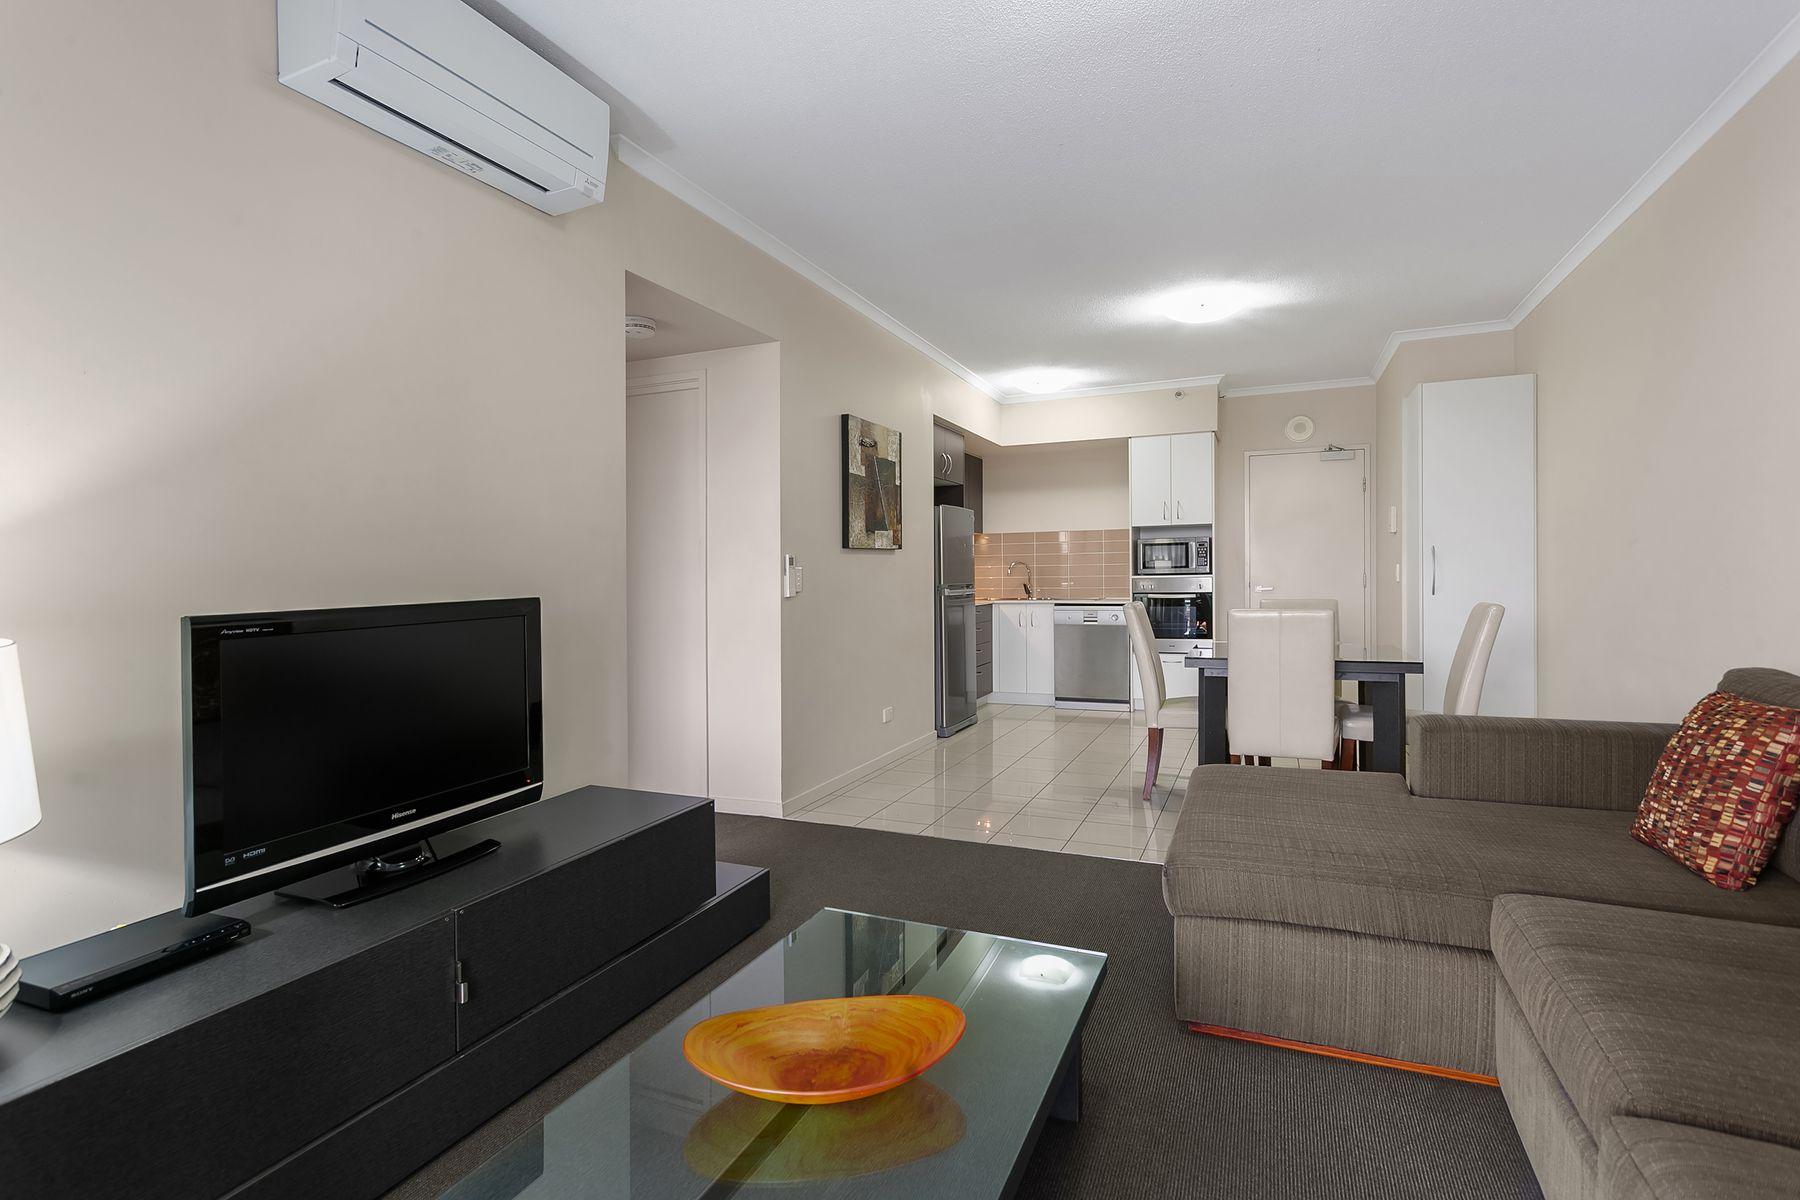 705/11 Ellenborough Street, Woodend, QLD 4305